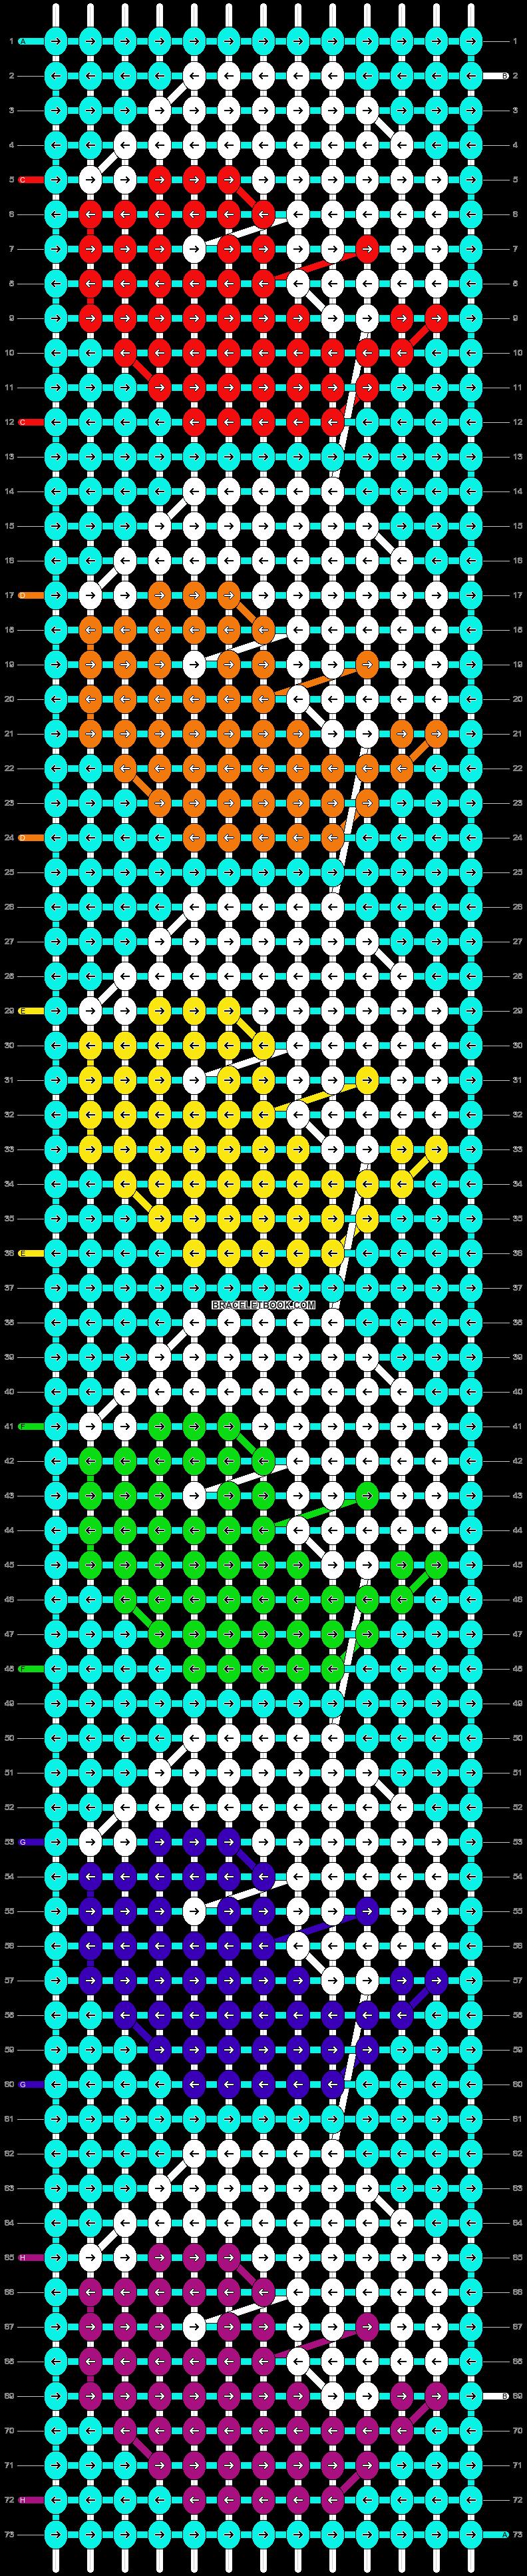 Alpha pattern #13509 pattern